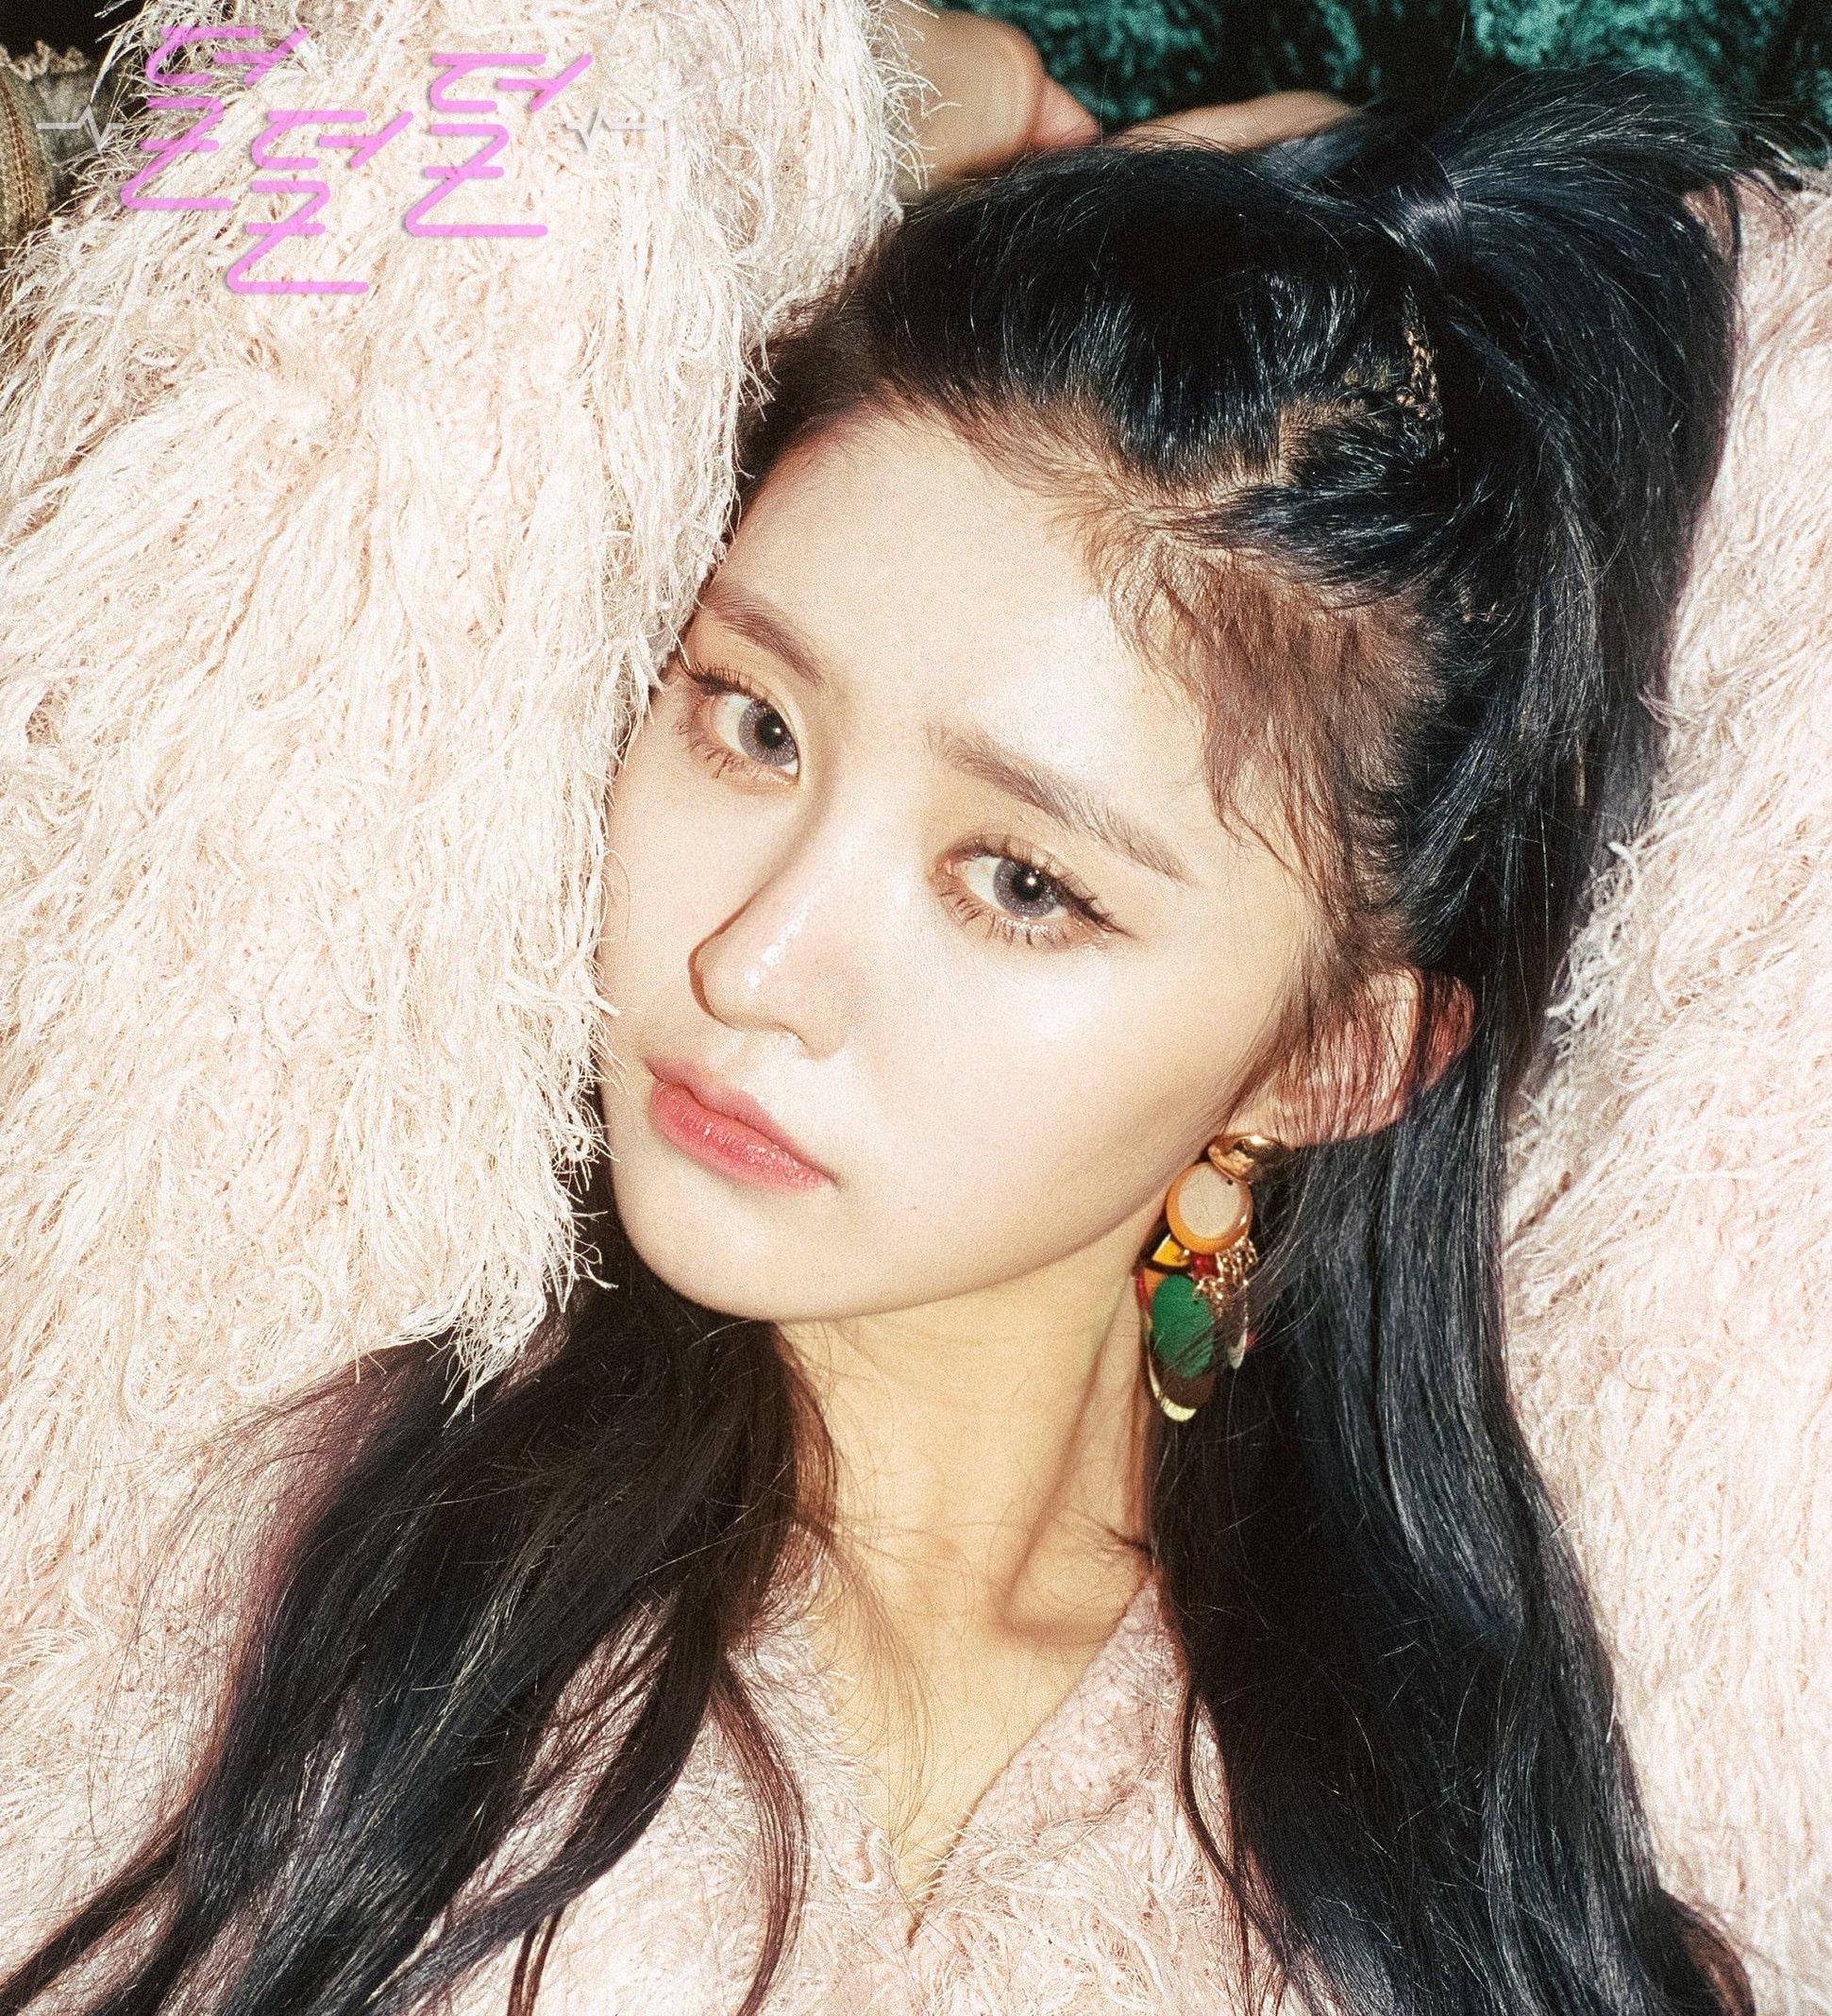 kiểu tóc đẹp của idol kpop